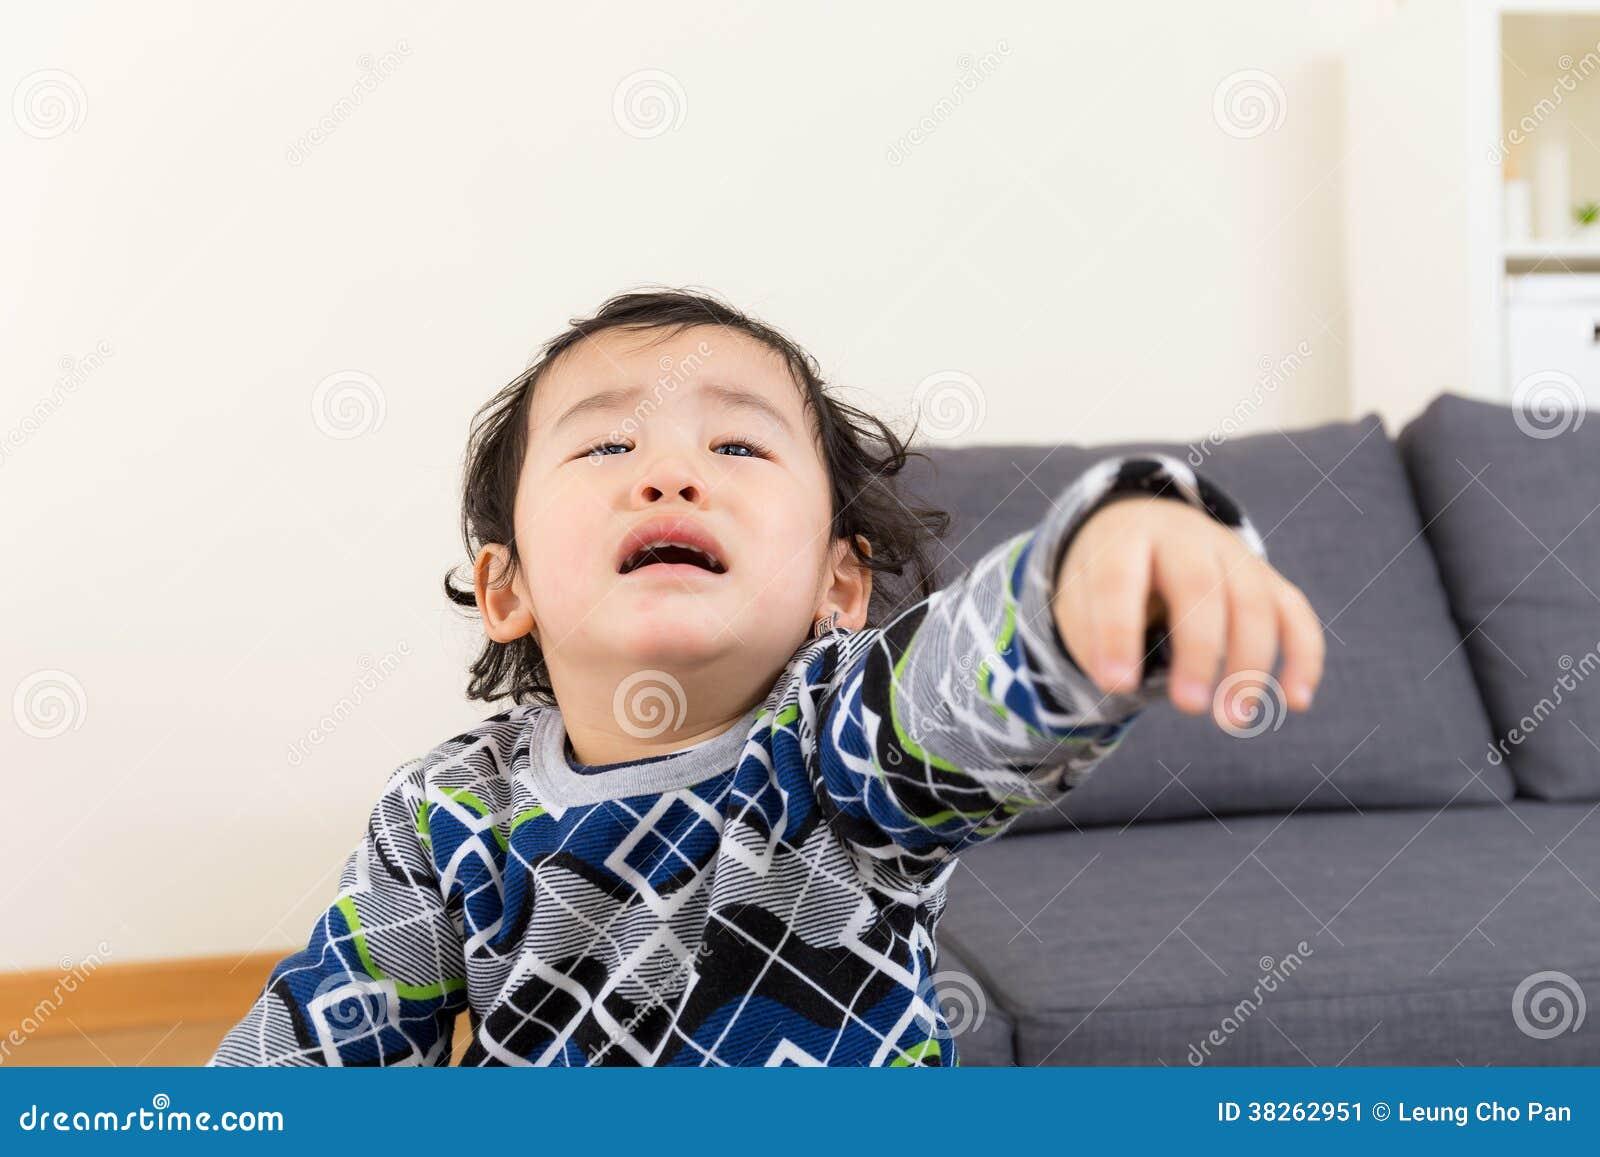 Asian Baby Boy Feeling Upset Stock Image - Image: 38262951